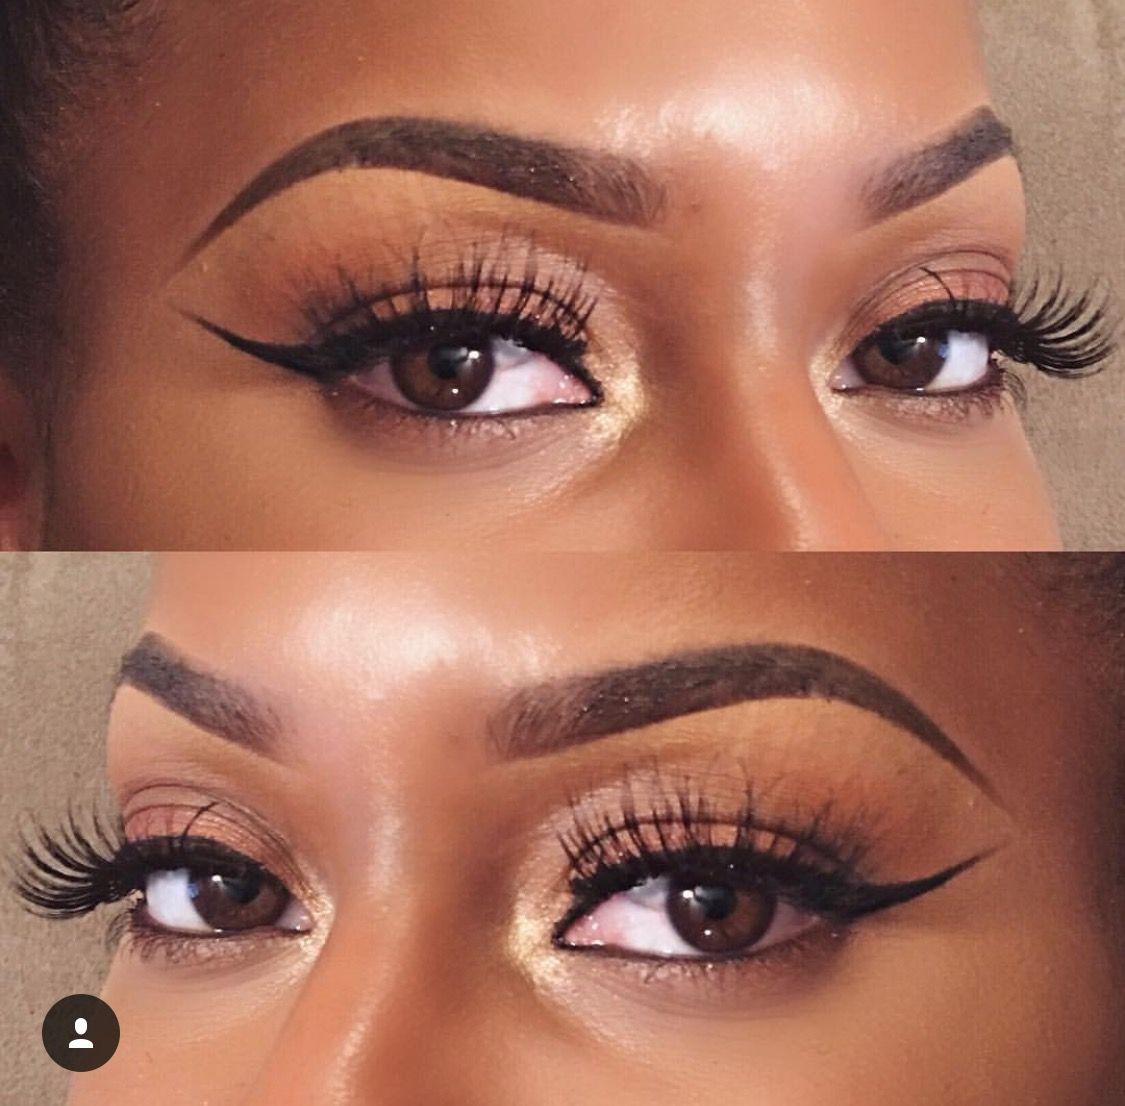 Makeup for black women makeup for Black women